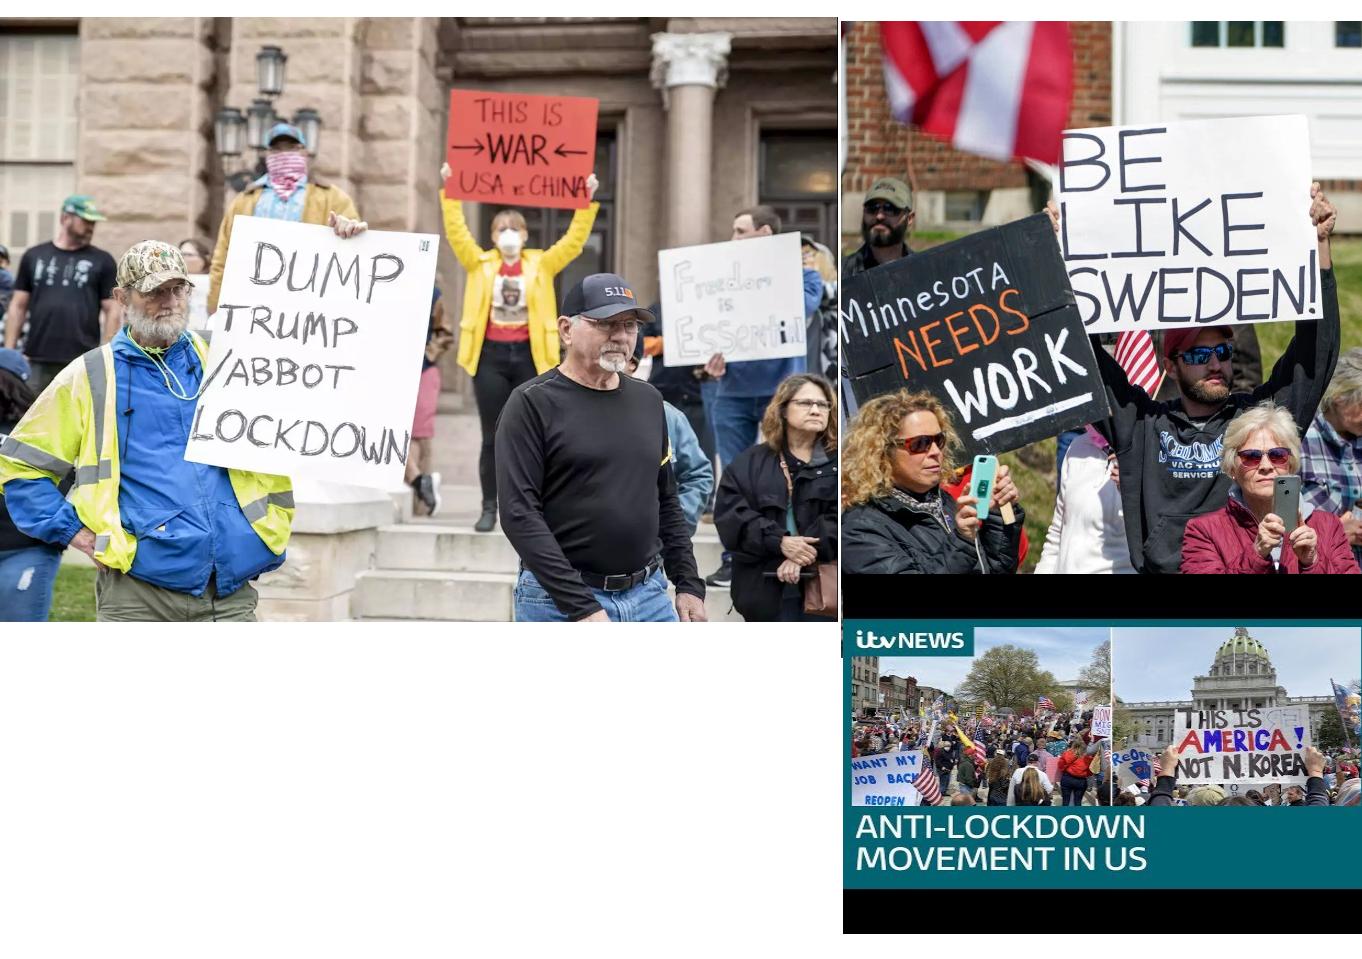 antilockdownprotests.png